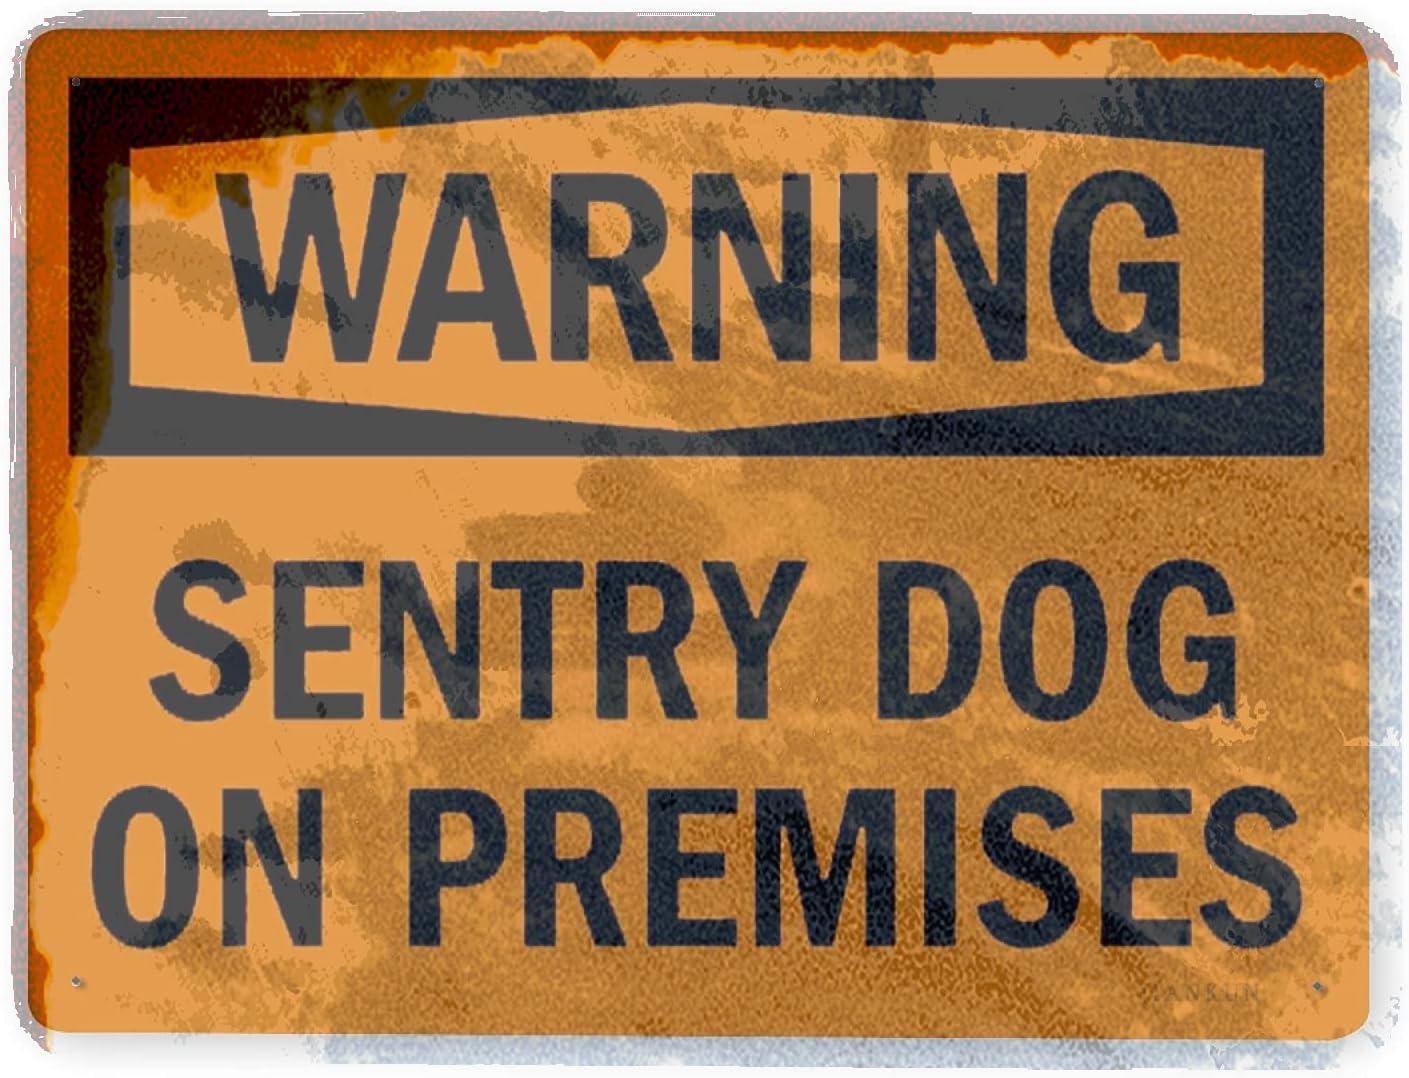 J.DXHYA Man Genuine Cave Decor 2 Pieces On Sign Award Warning Dog Sentry Premi